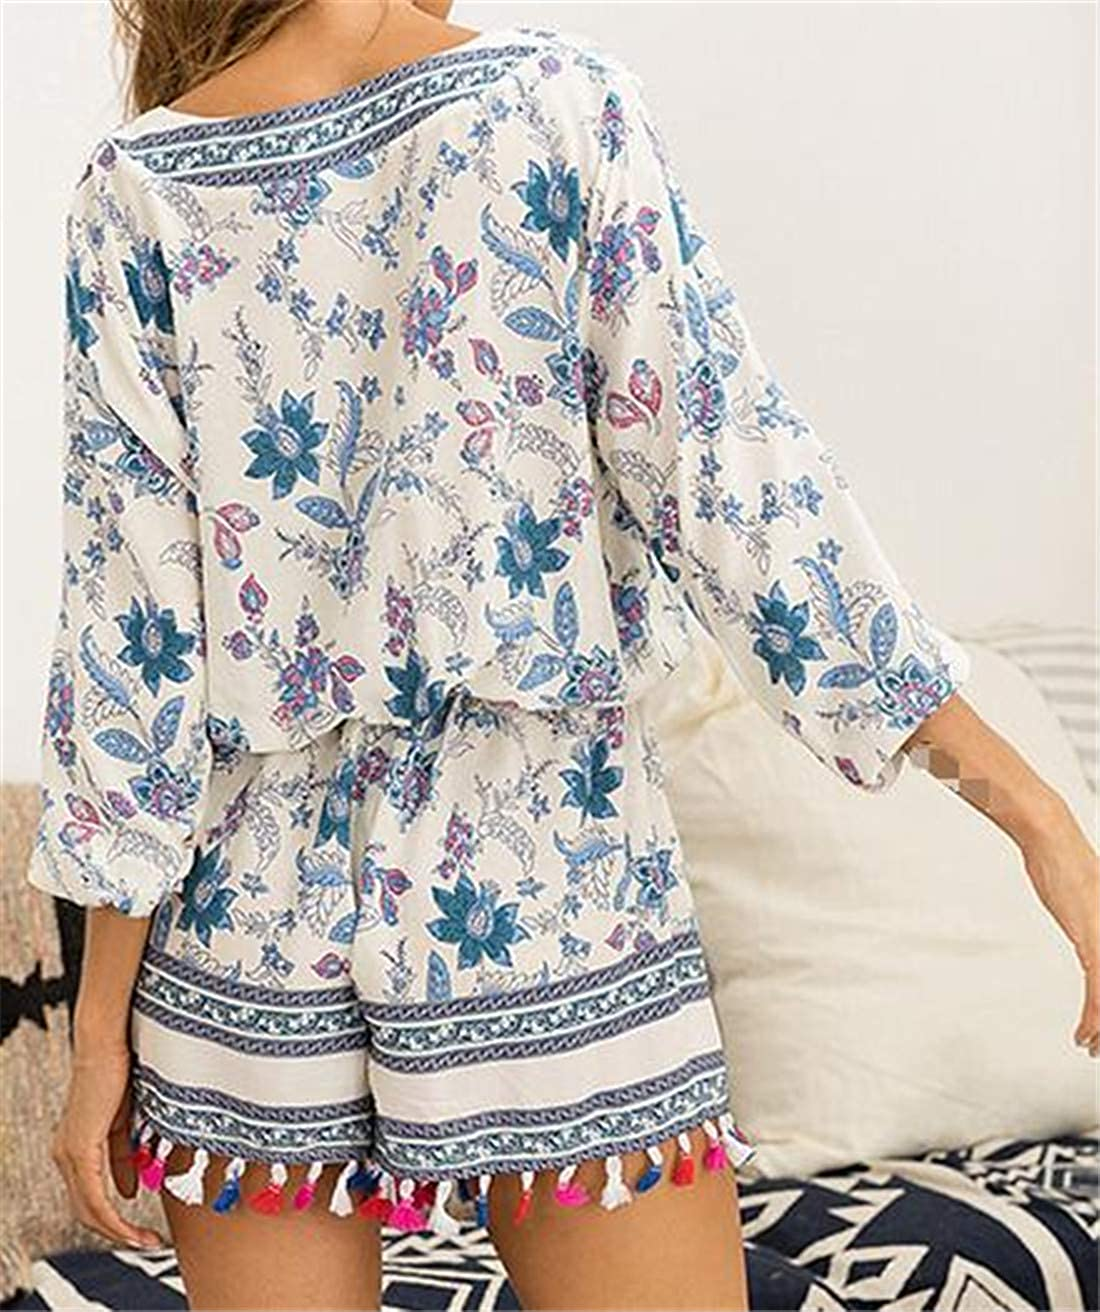 Pandapang Womens Fashion Playsuit Flower 3//4 Sleeve Tassel V-Neck Short Jumpsuits Rompers